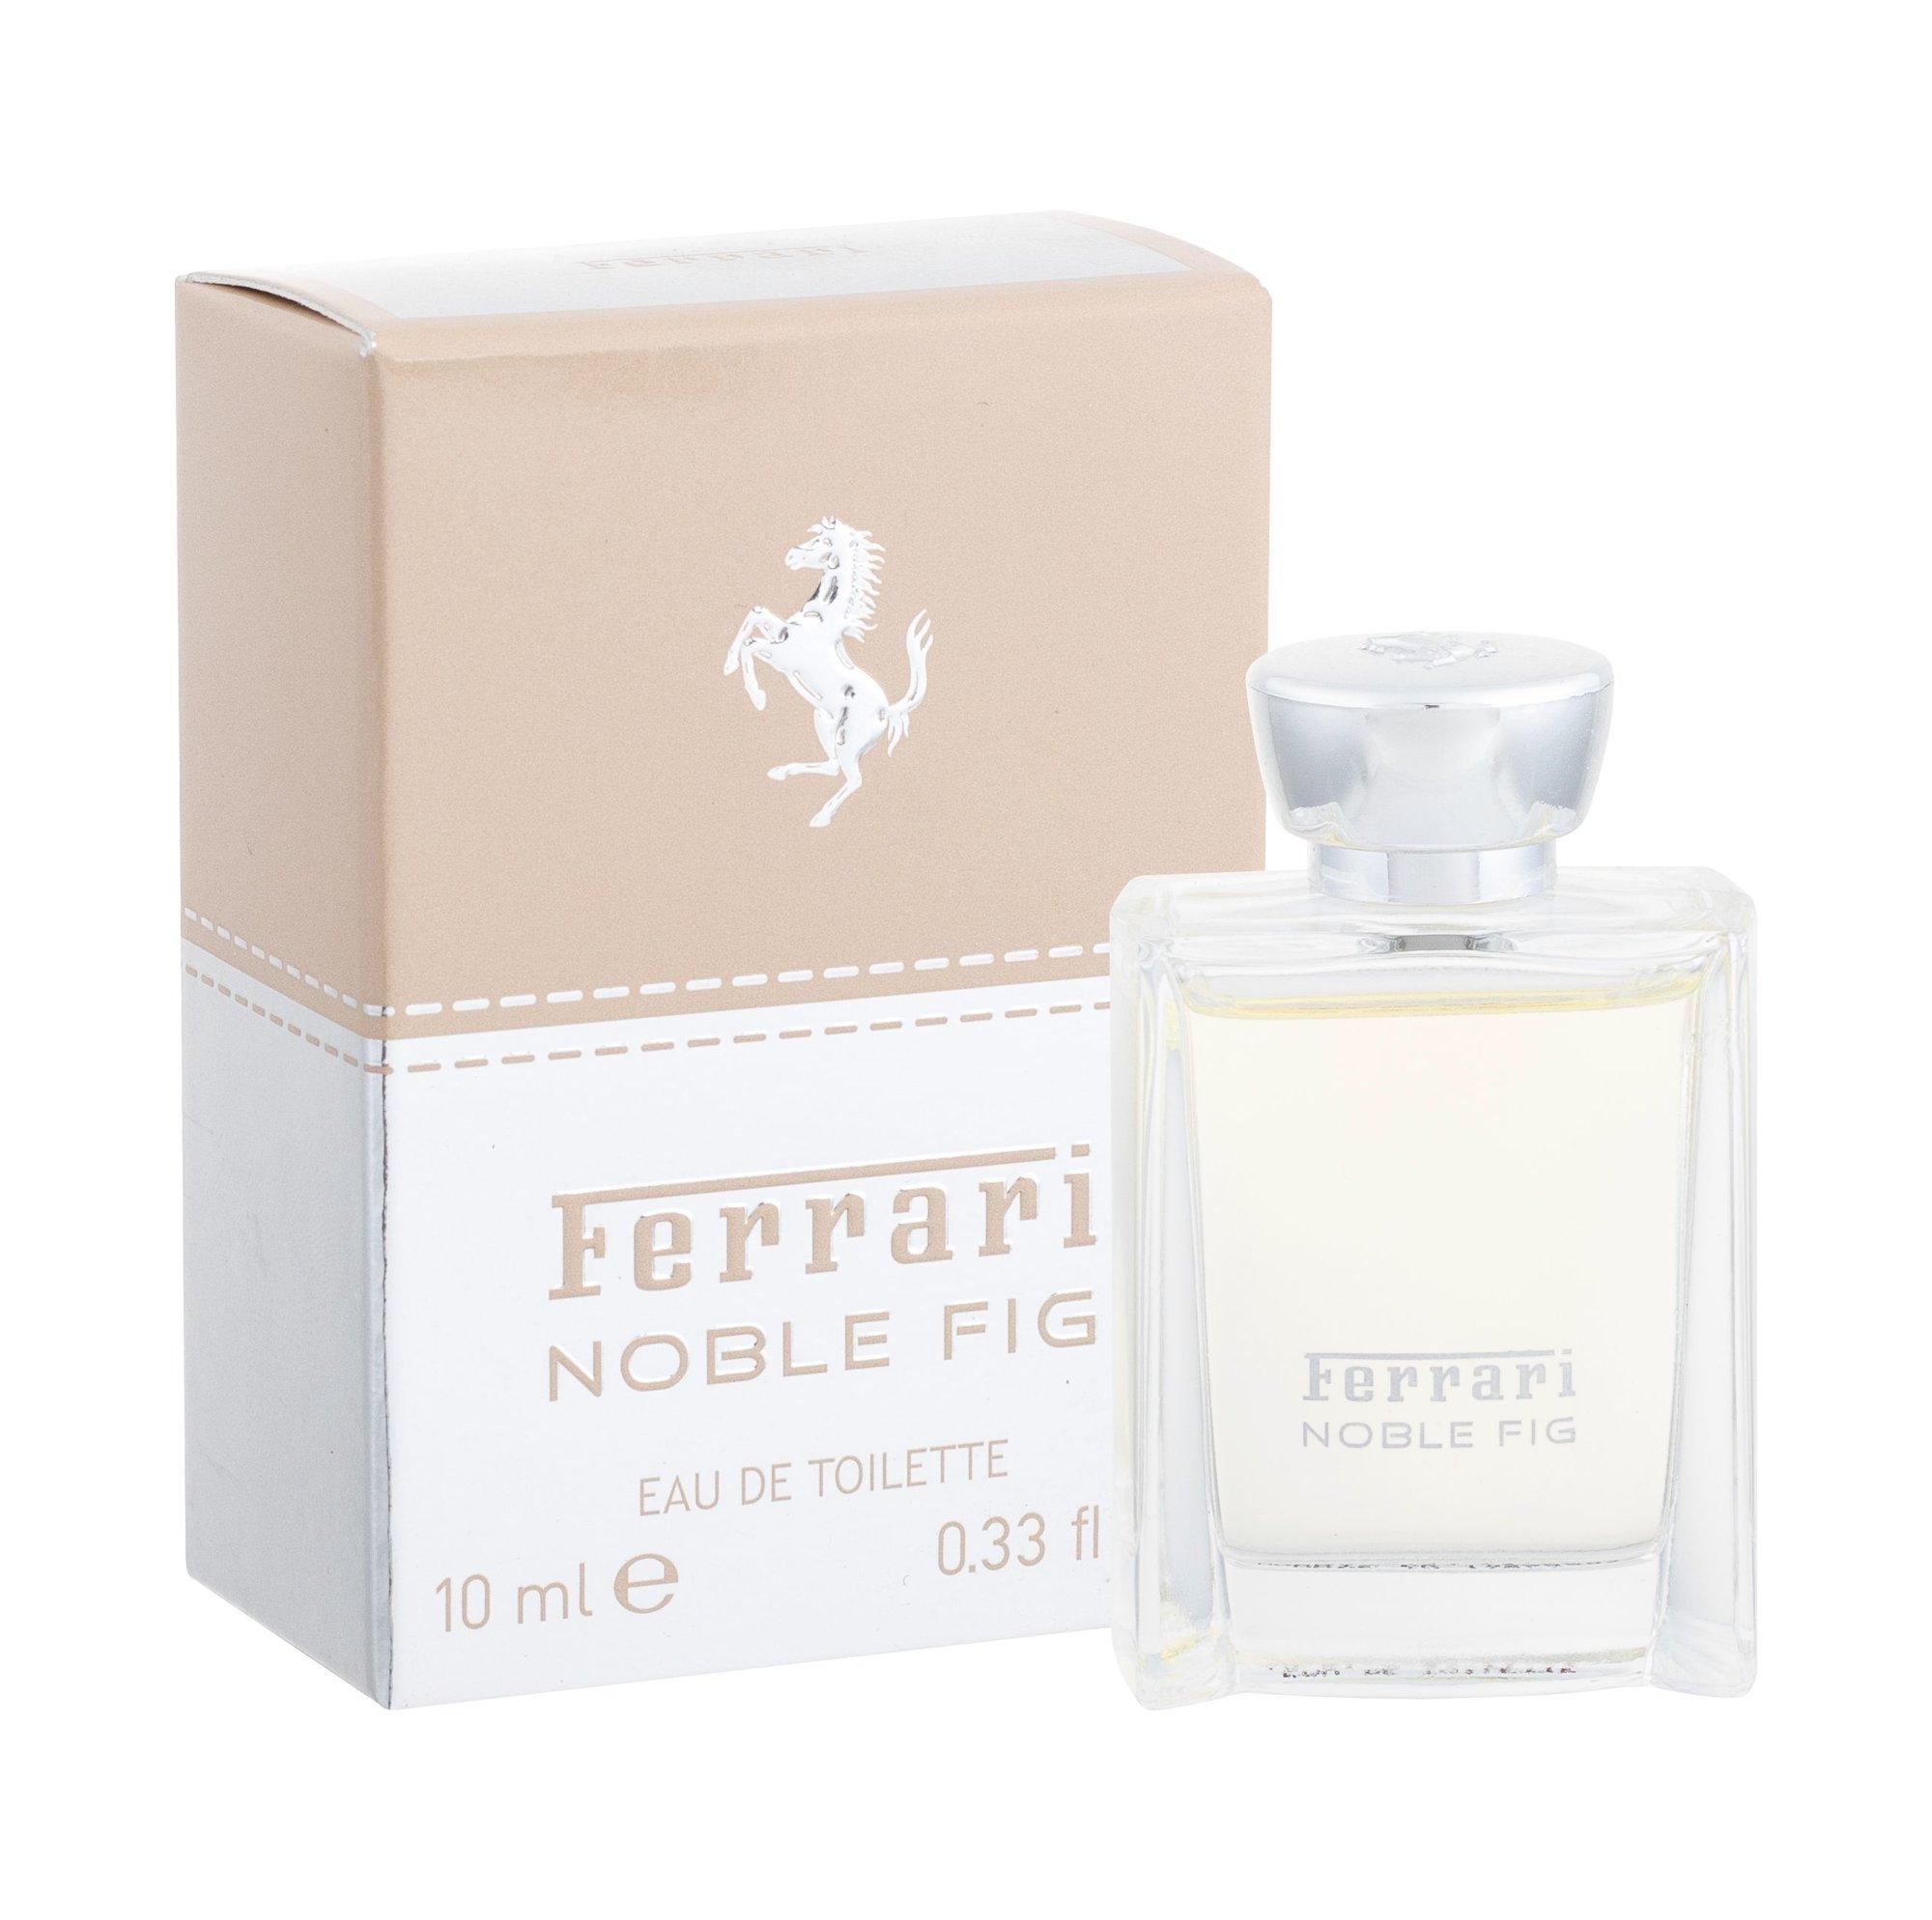 Ferrari Noble Fig Eau de Toilette 10ml